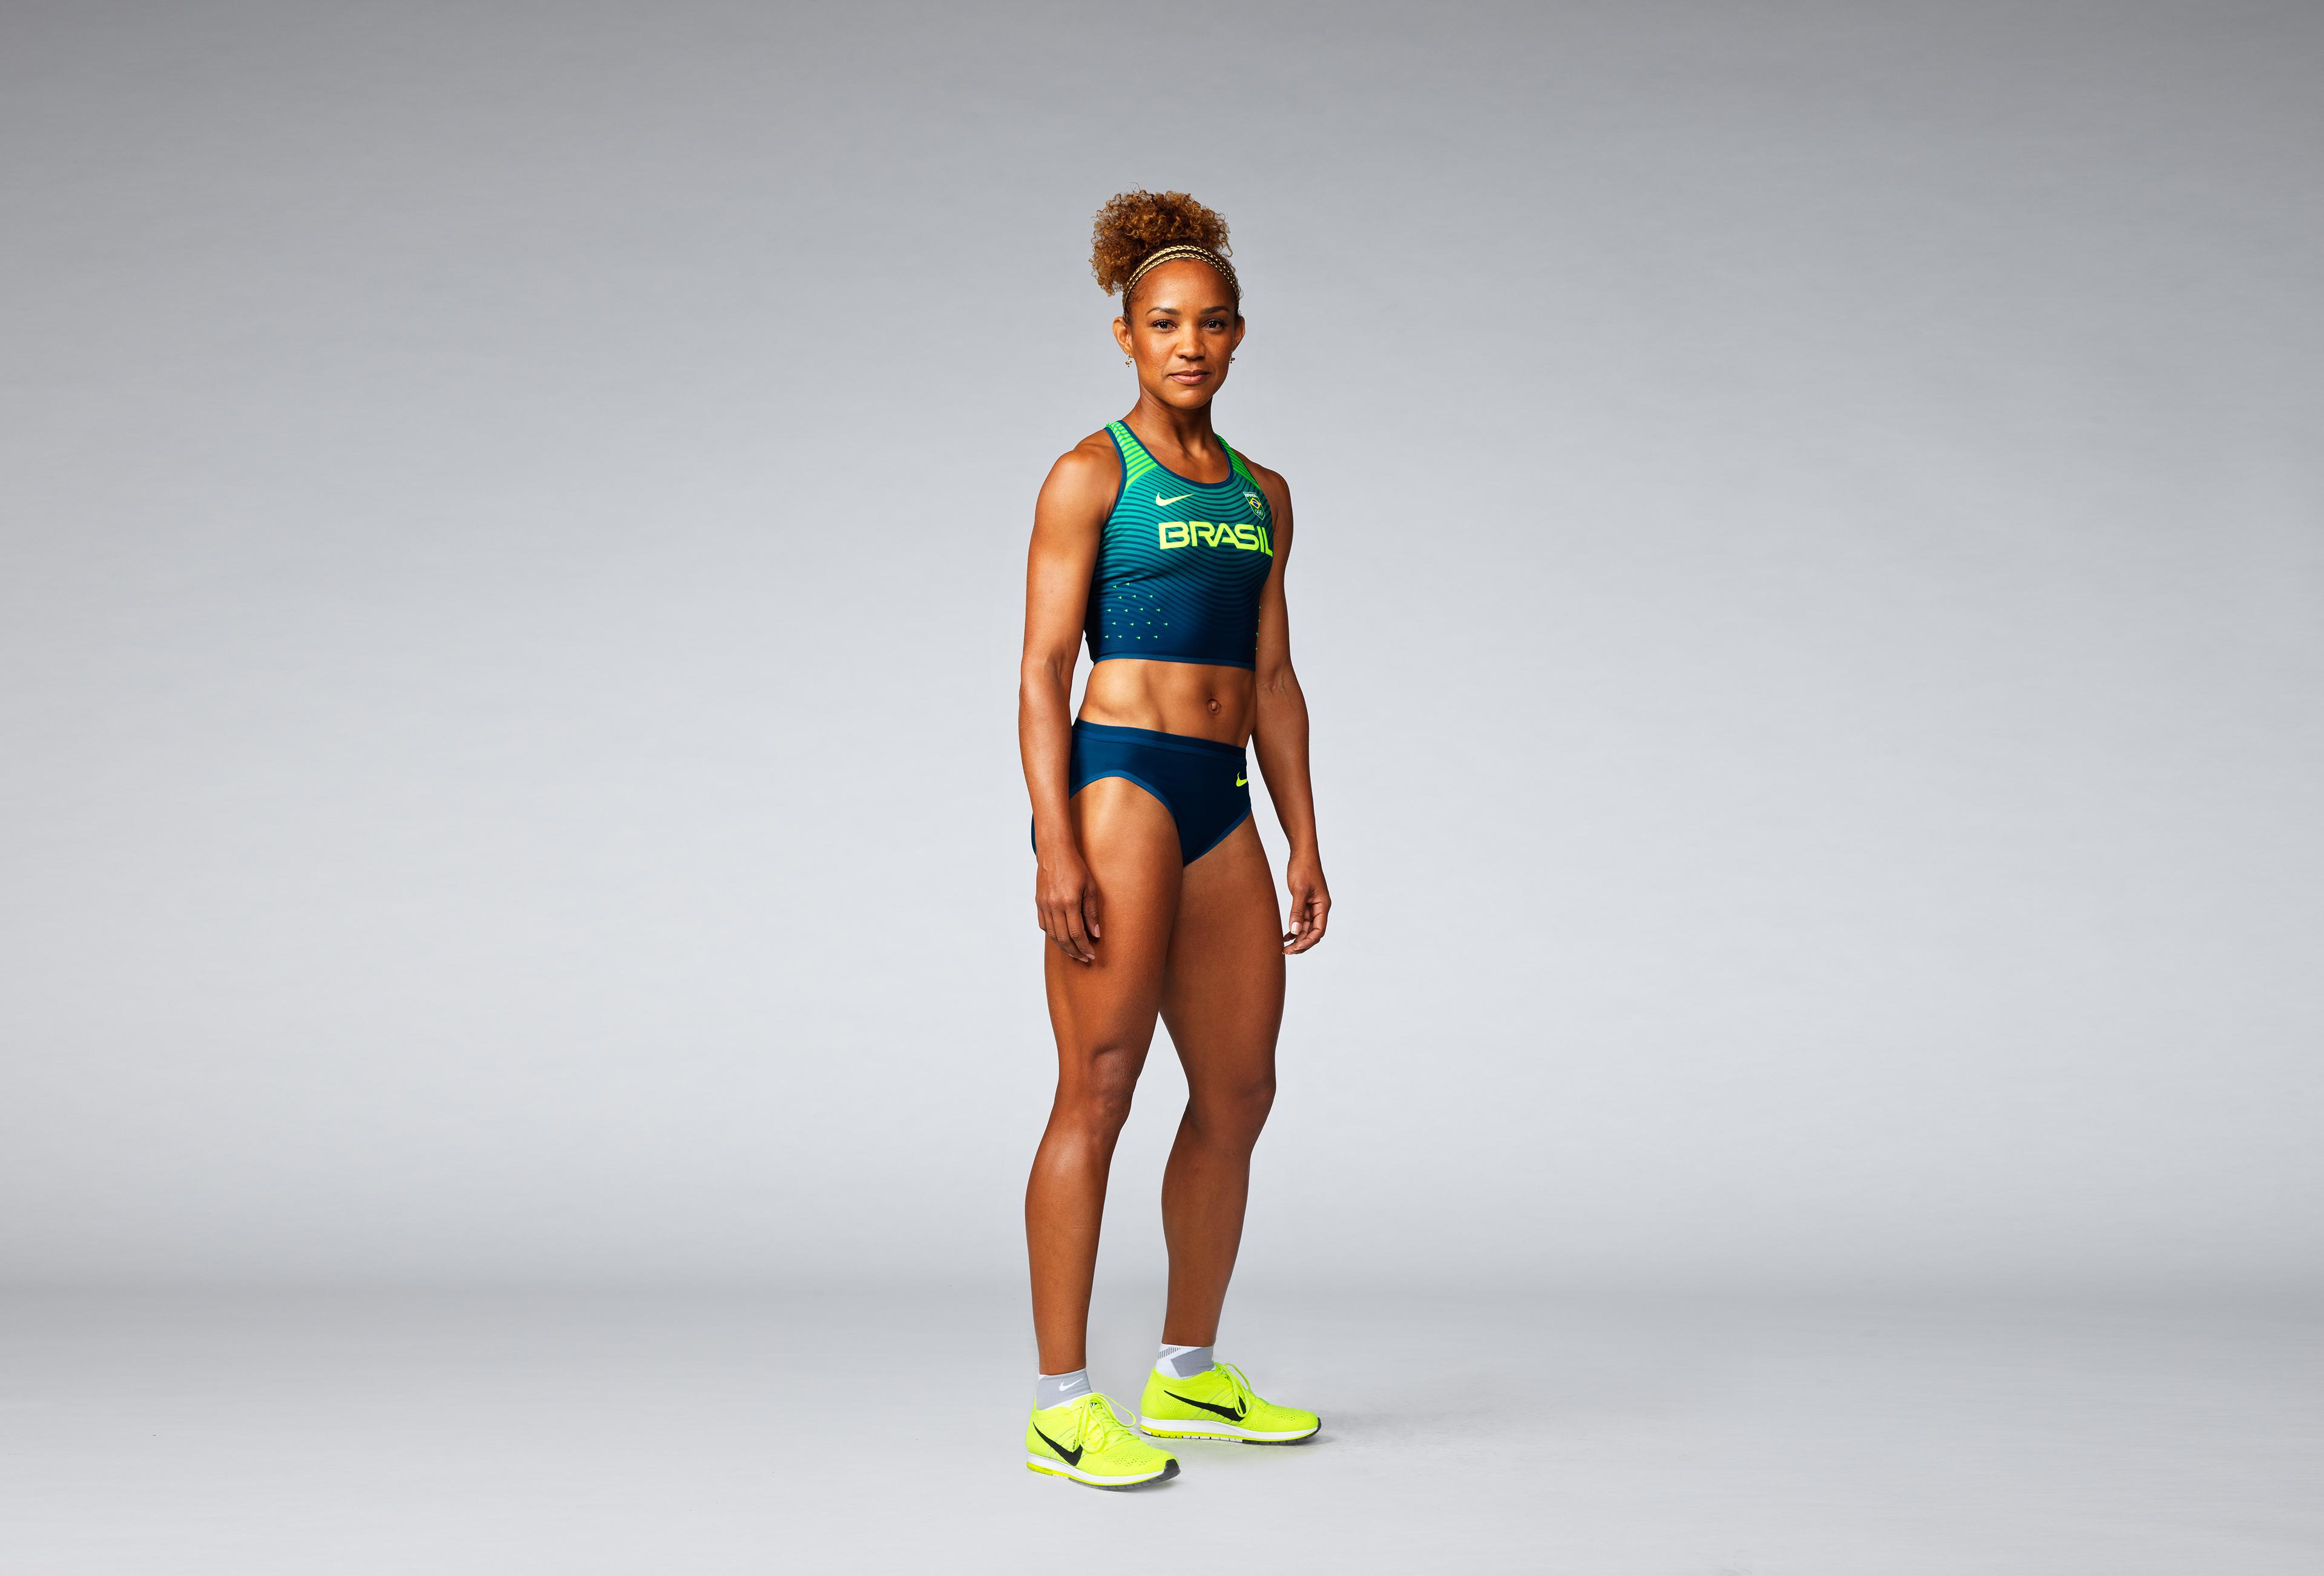 Delle Donne Jersey Brasil 2016 Nike Vapor Track Amp Field Kits Nike News